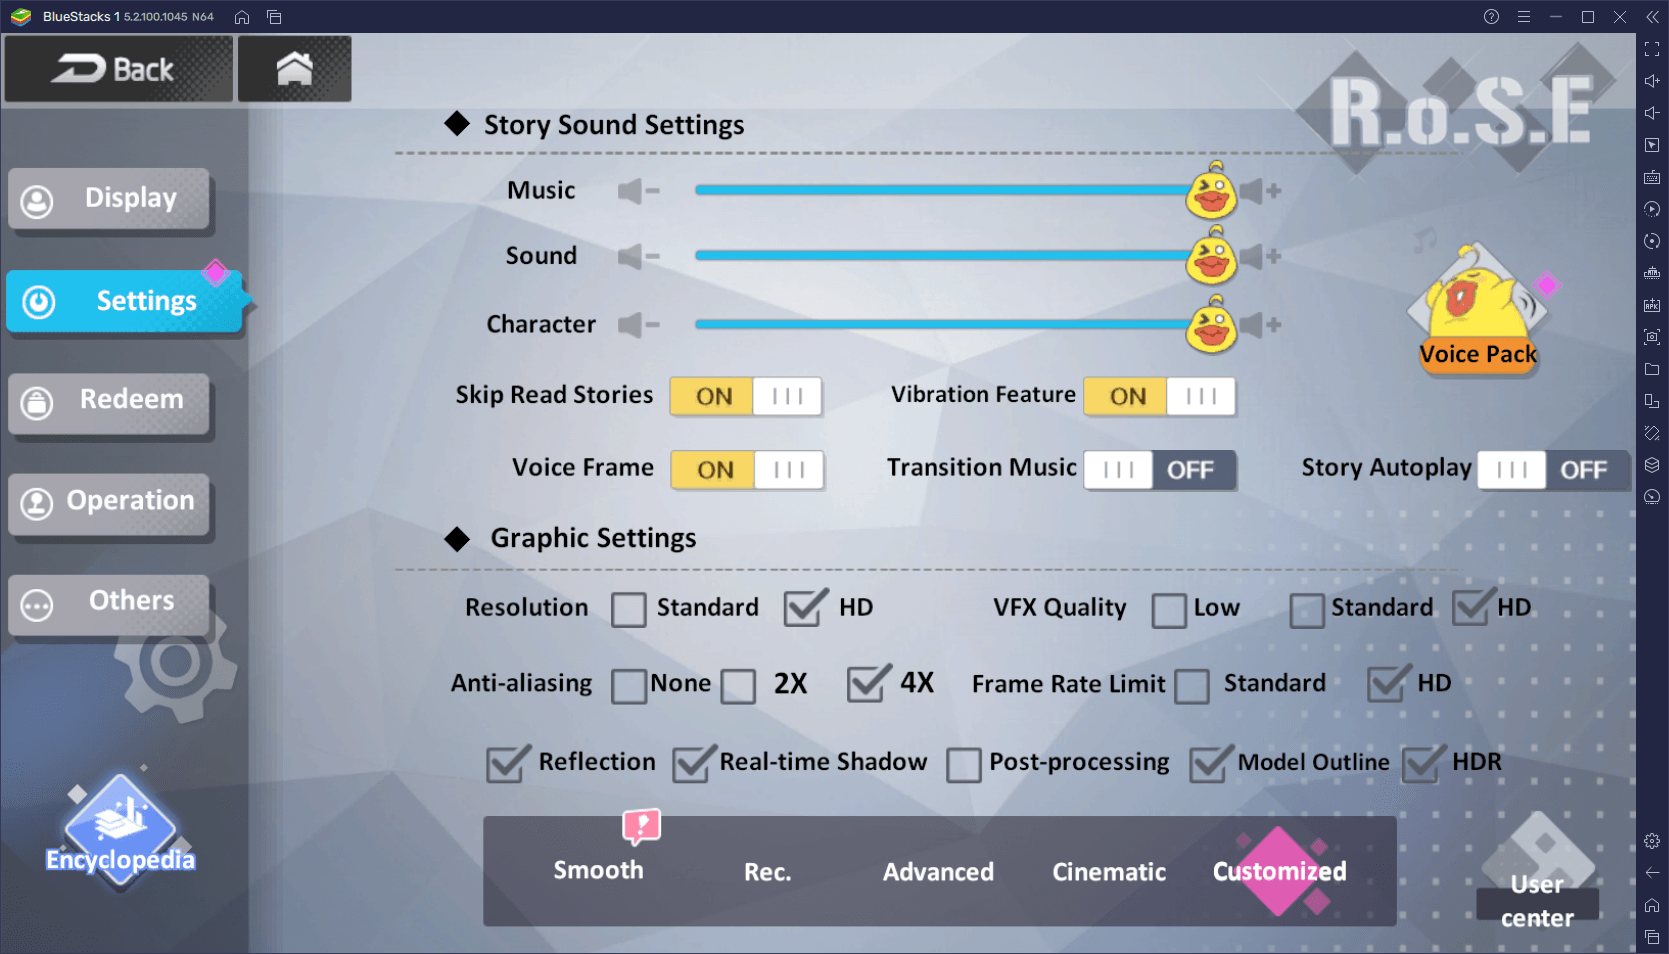 Girl Cafe Gun sur PC – Comment Optimiser Votre Gameplay Avec BlueStacks